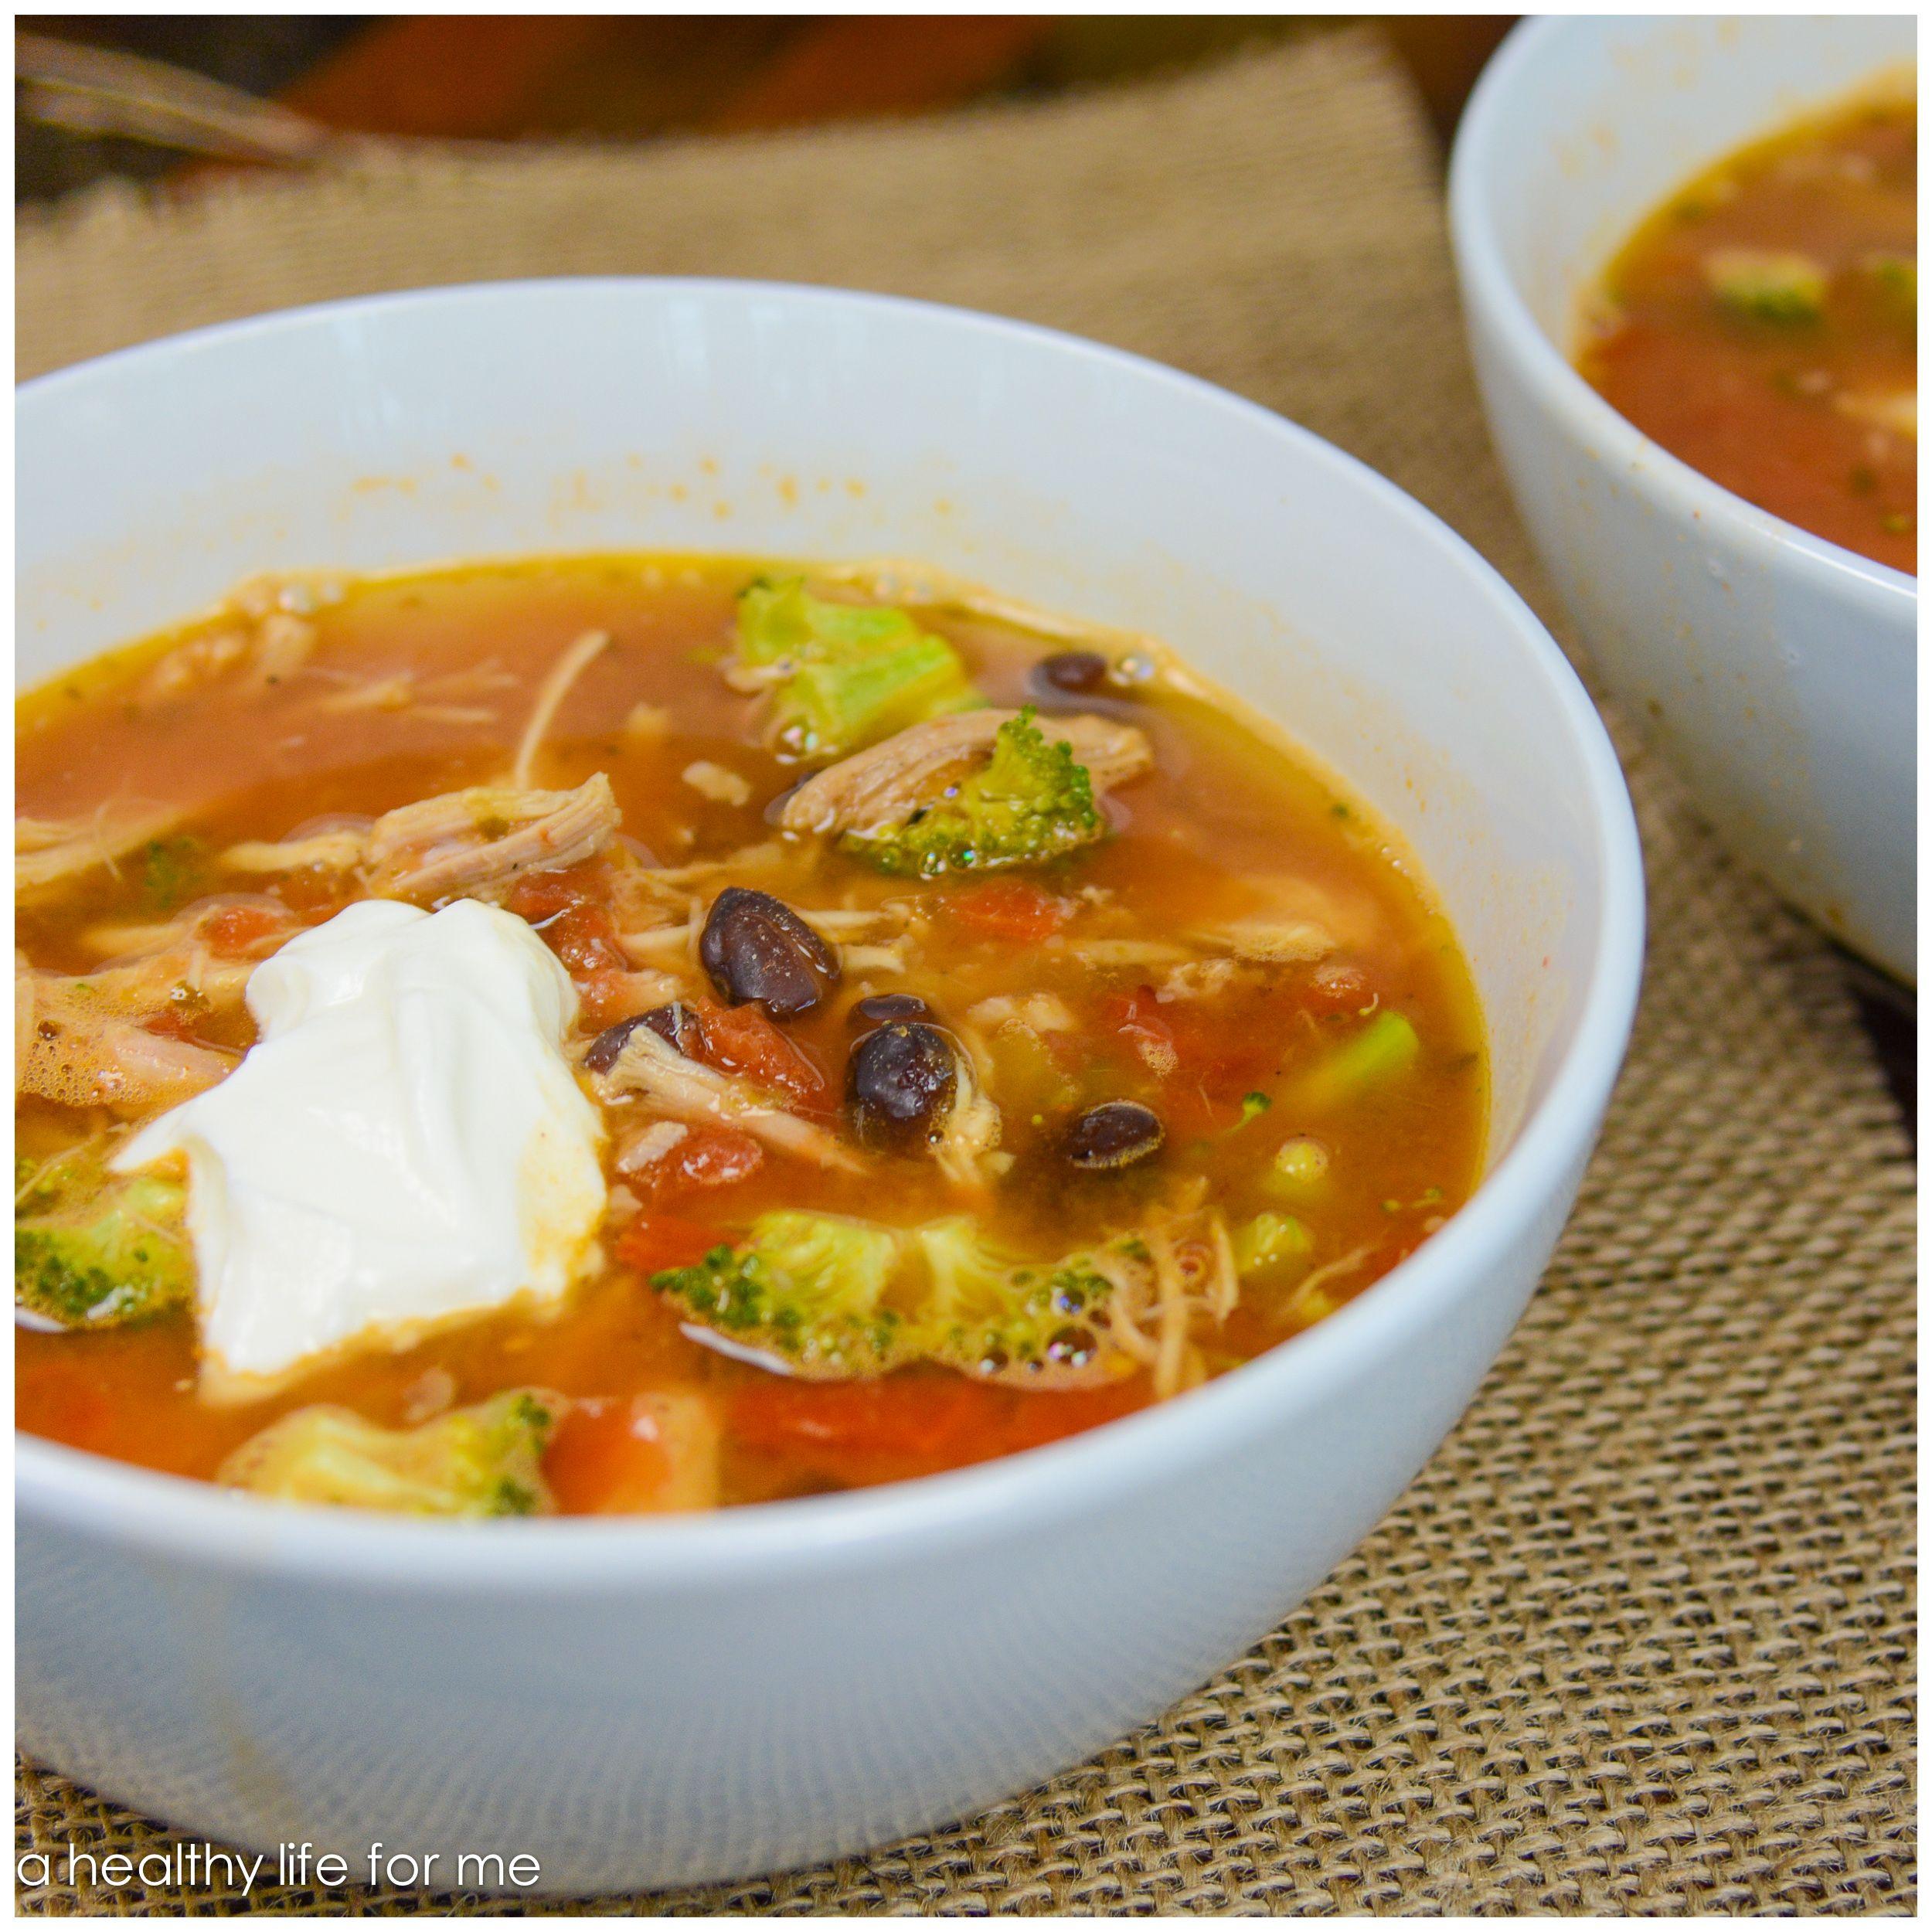 Healthy Turkey Tortilla Soup Recipe with Amy Stafford at www.ahealthylifeforme.com